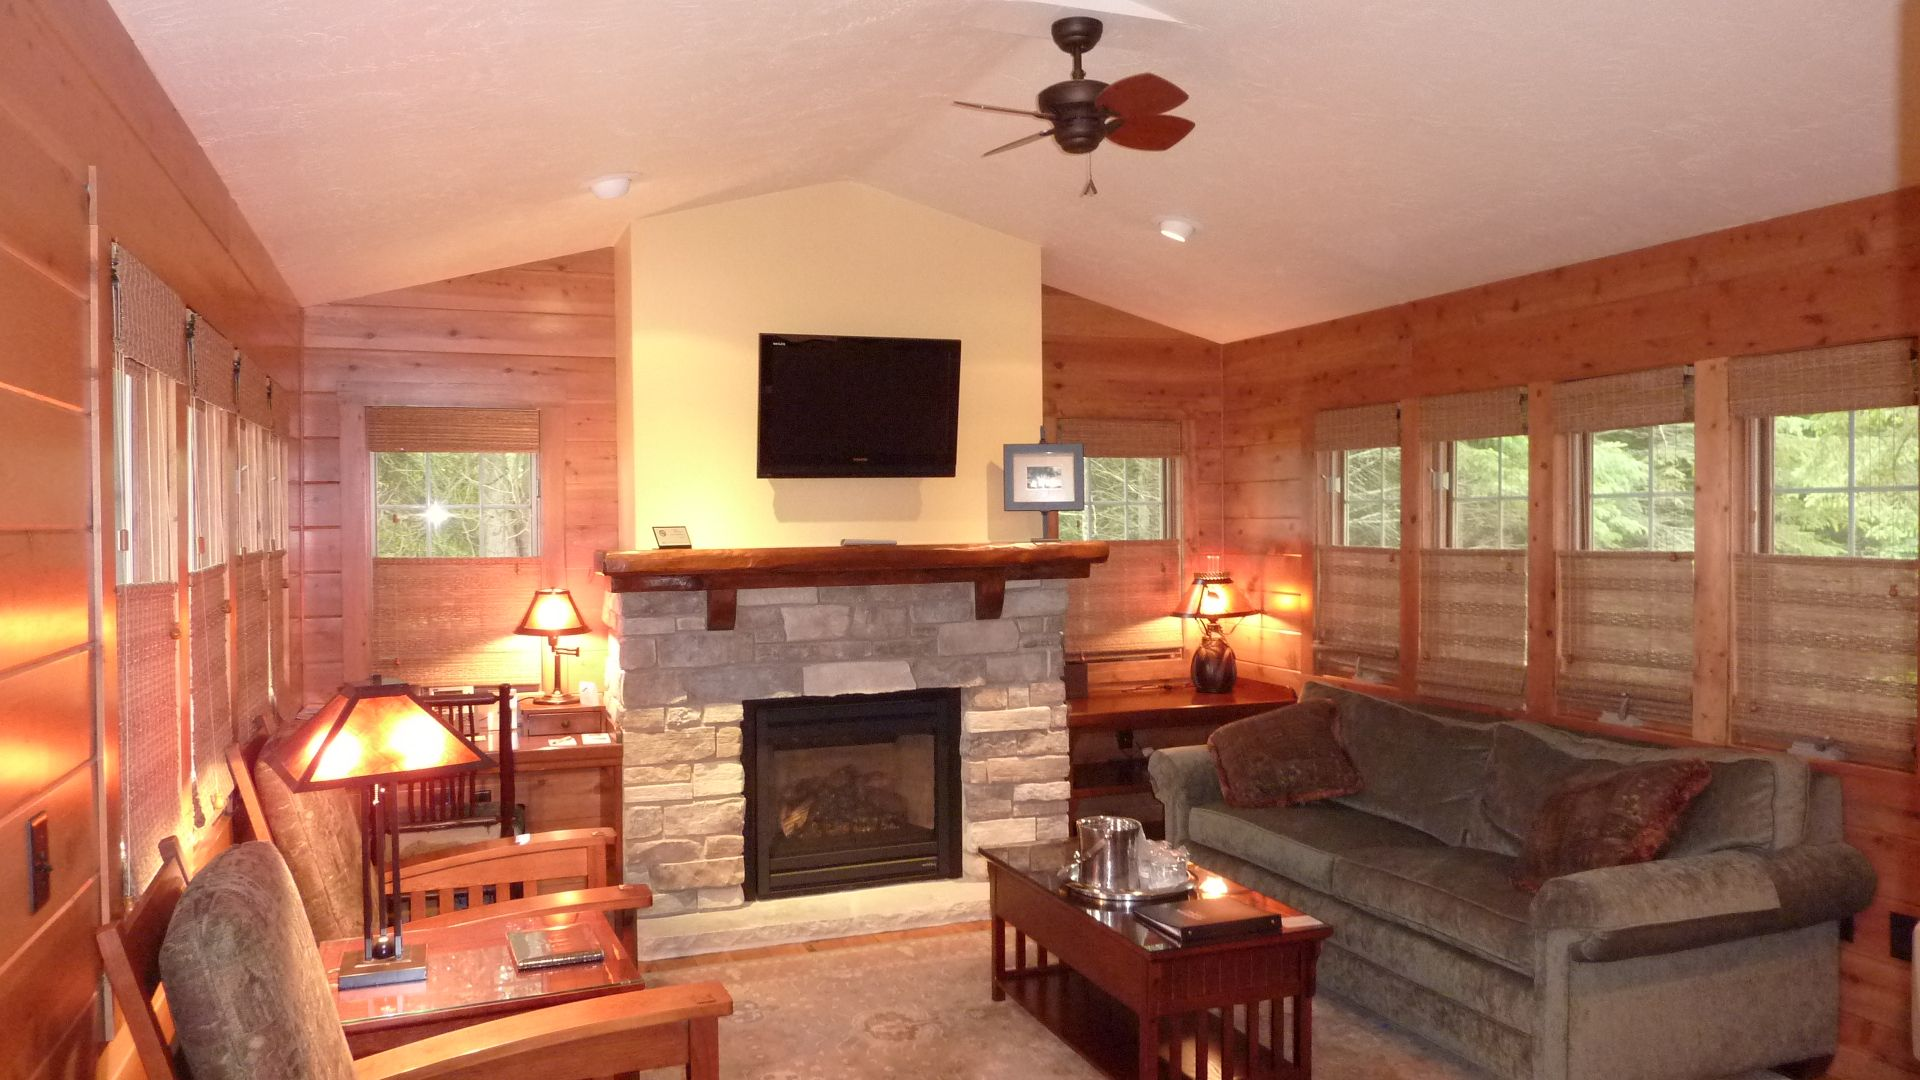 Comfy Honeymoon Suite -Walnut - Gordon Lodge in Door County Wisconsin - 920- & Comfy Honeymoon Suite -Walnut - Gordon Lodge in Door County ... pezcame.com